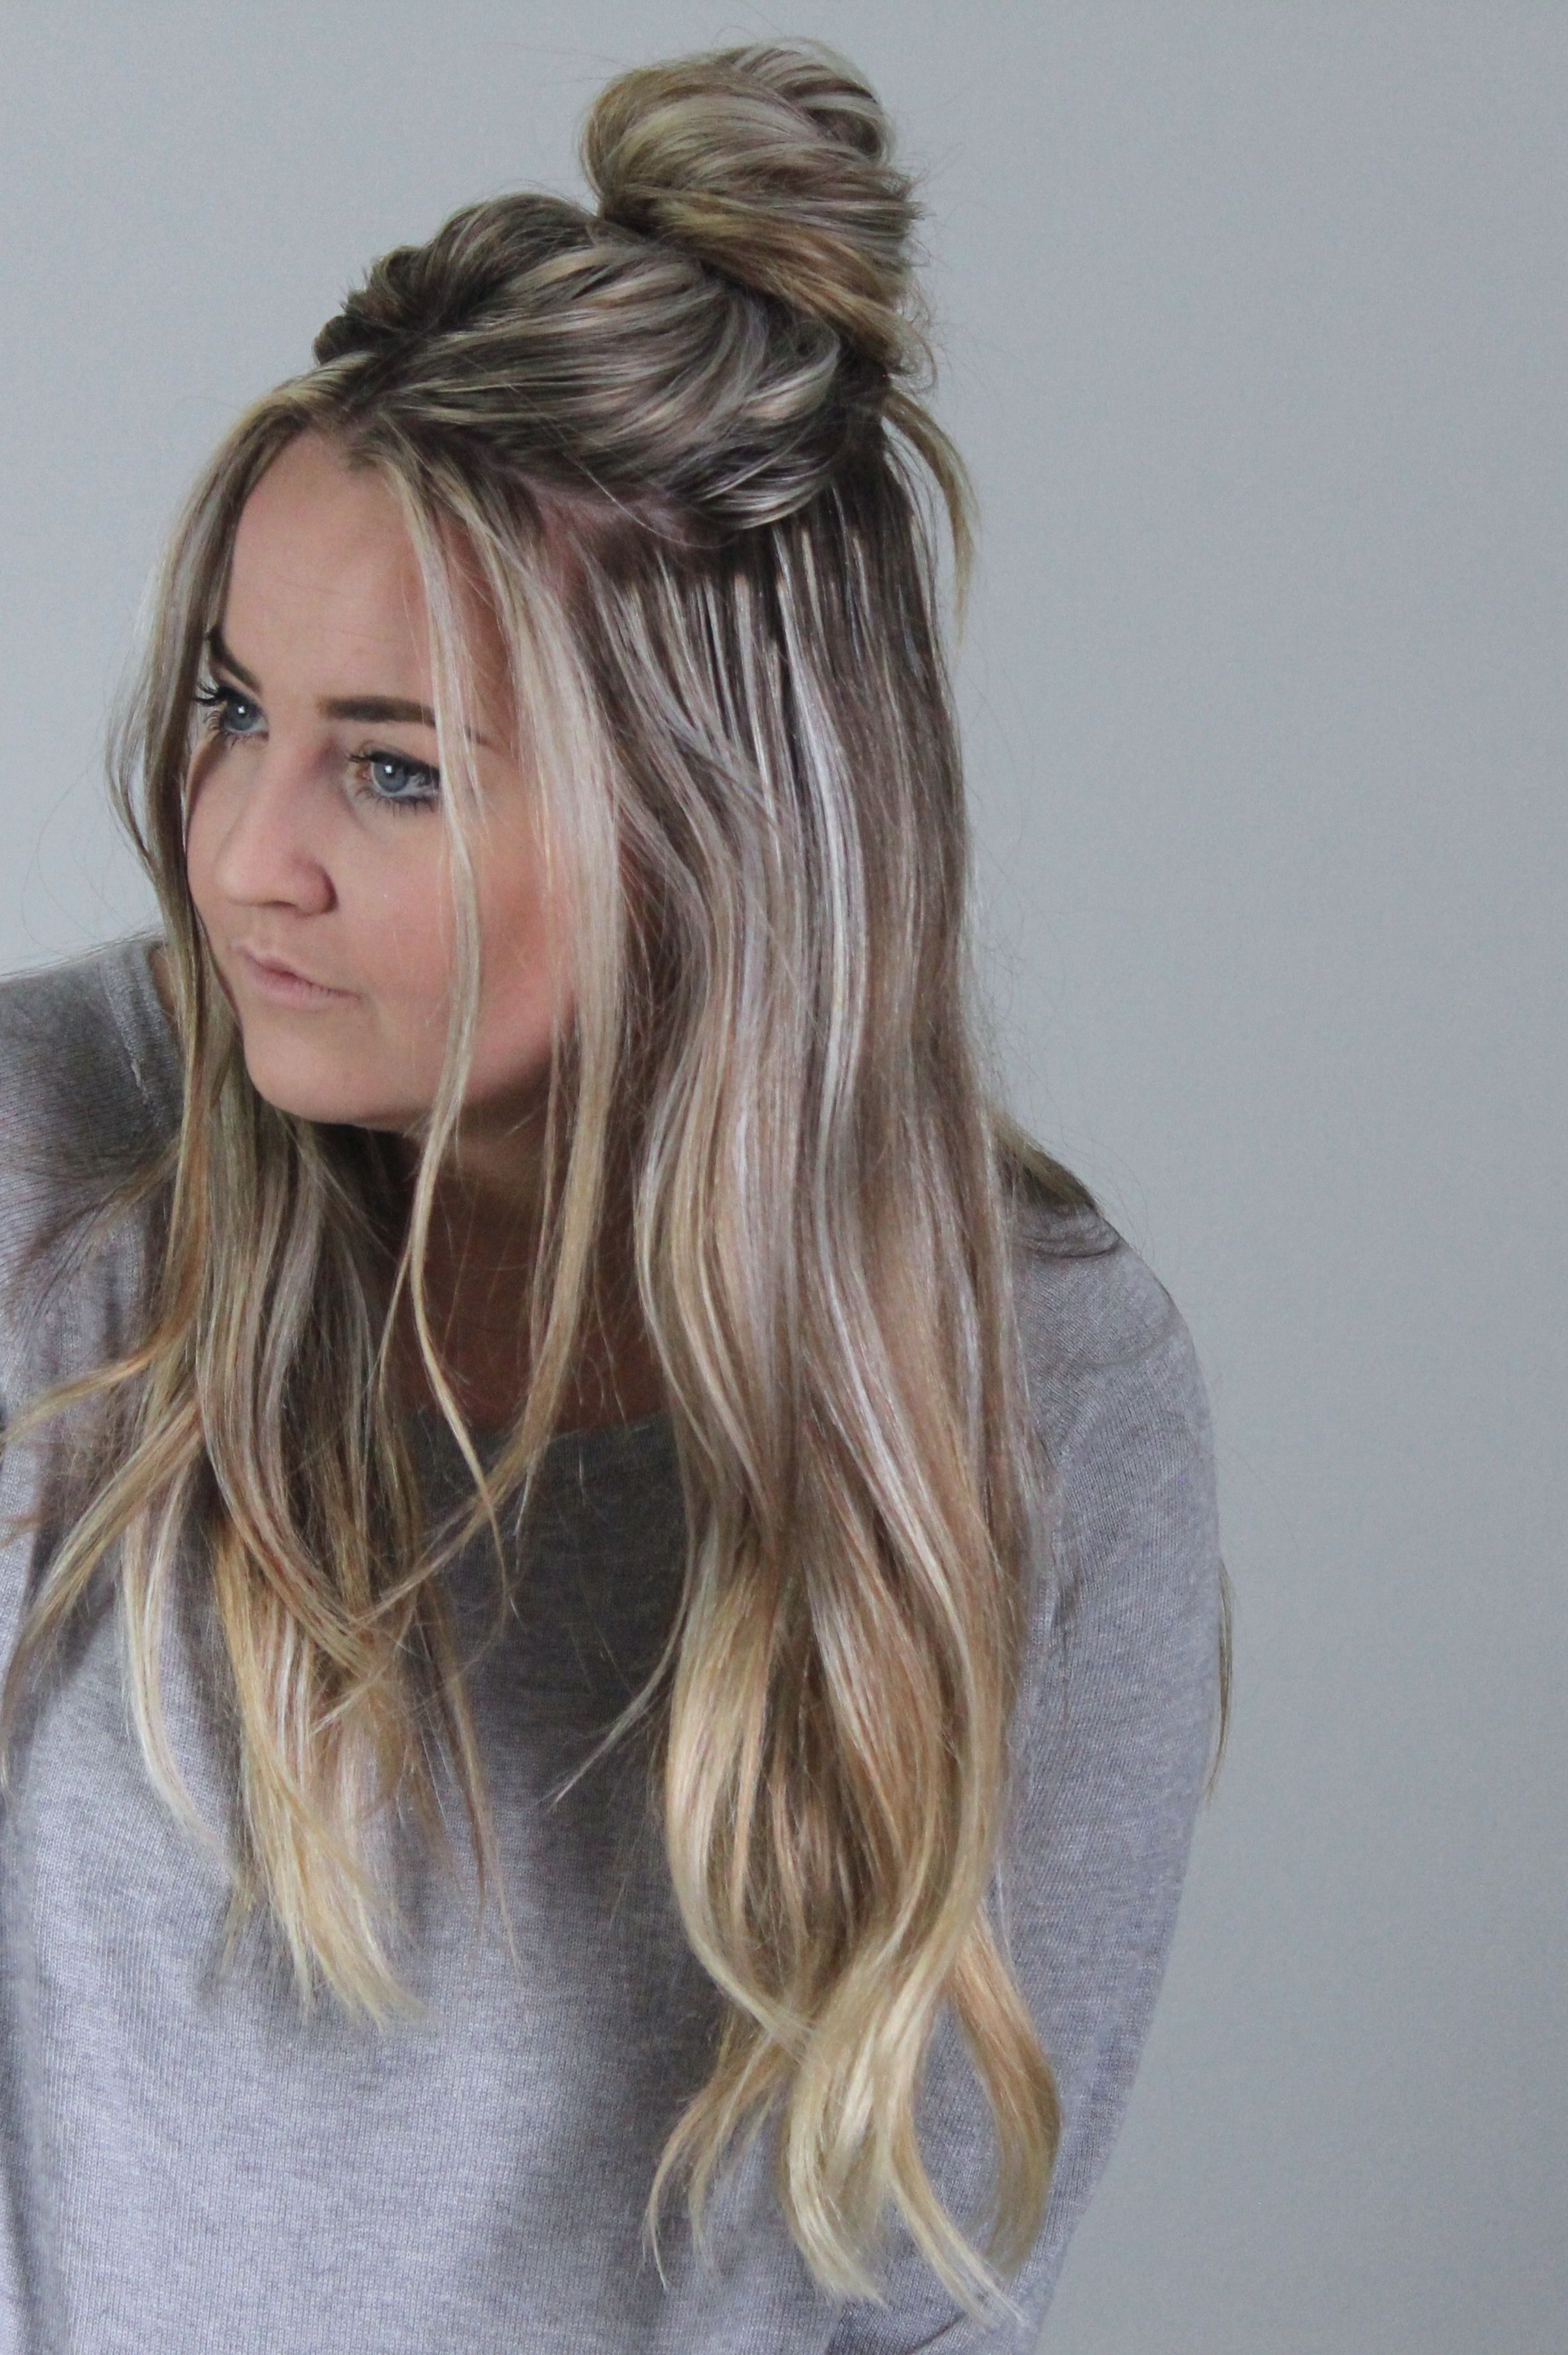 Quick 2 Minute Half Up Messy Bun Tutorial Cassie Scroggins Medium Hair Styles Hair Styles Easy Hairstyles For Long Hair